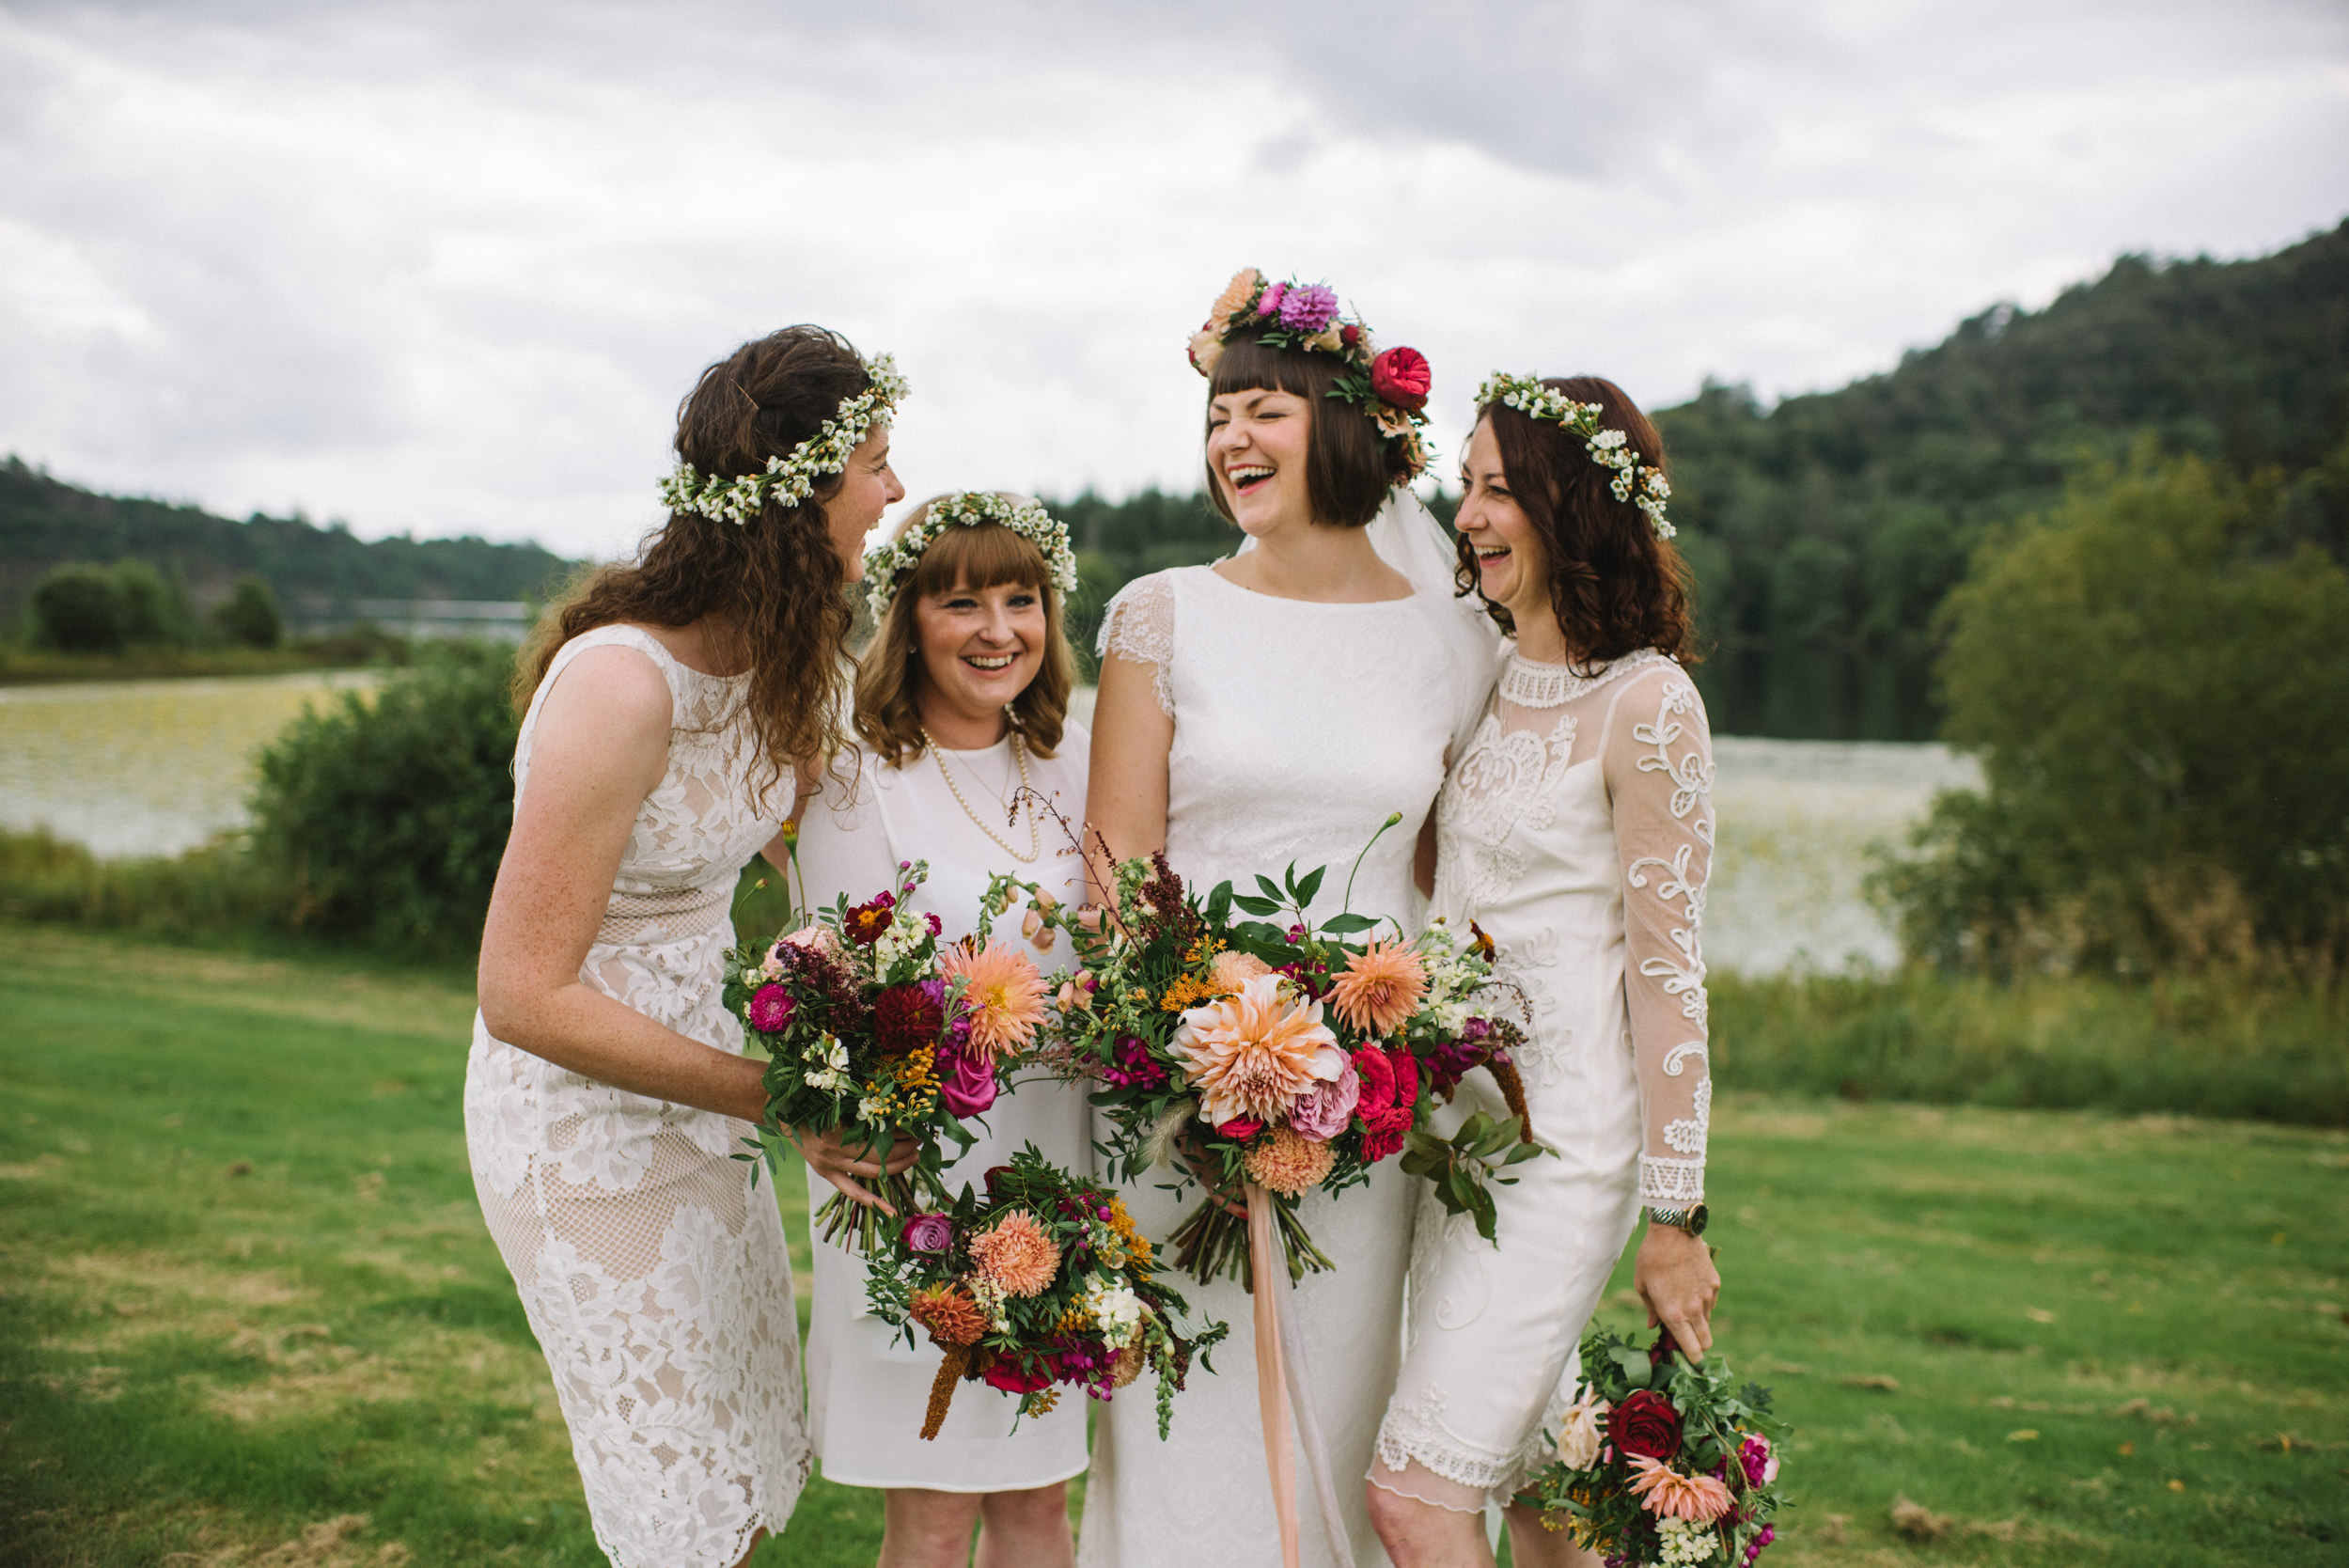 0148-alternative-wedding-portrait-family-kids-photographer-glasgow-scotland.JPG